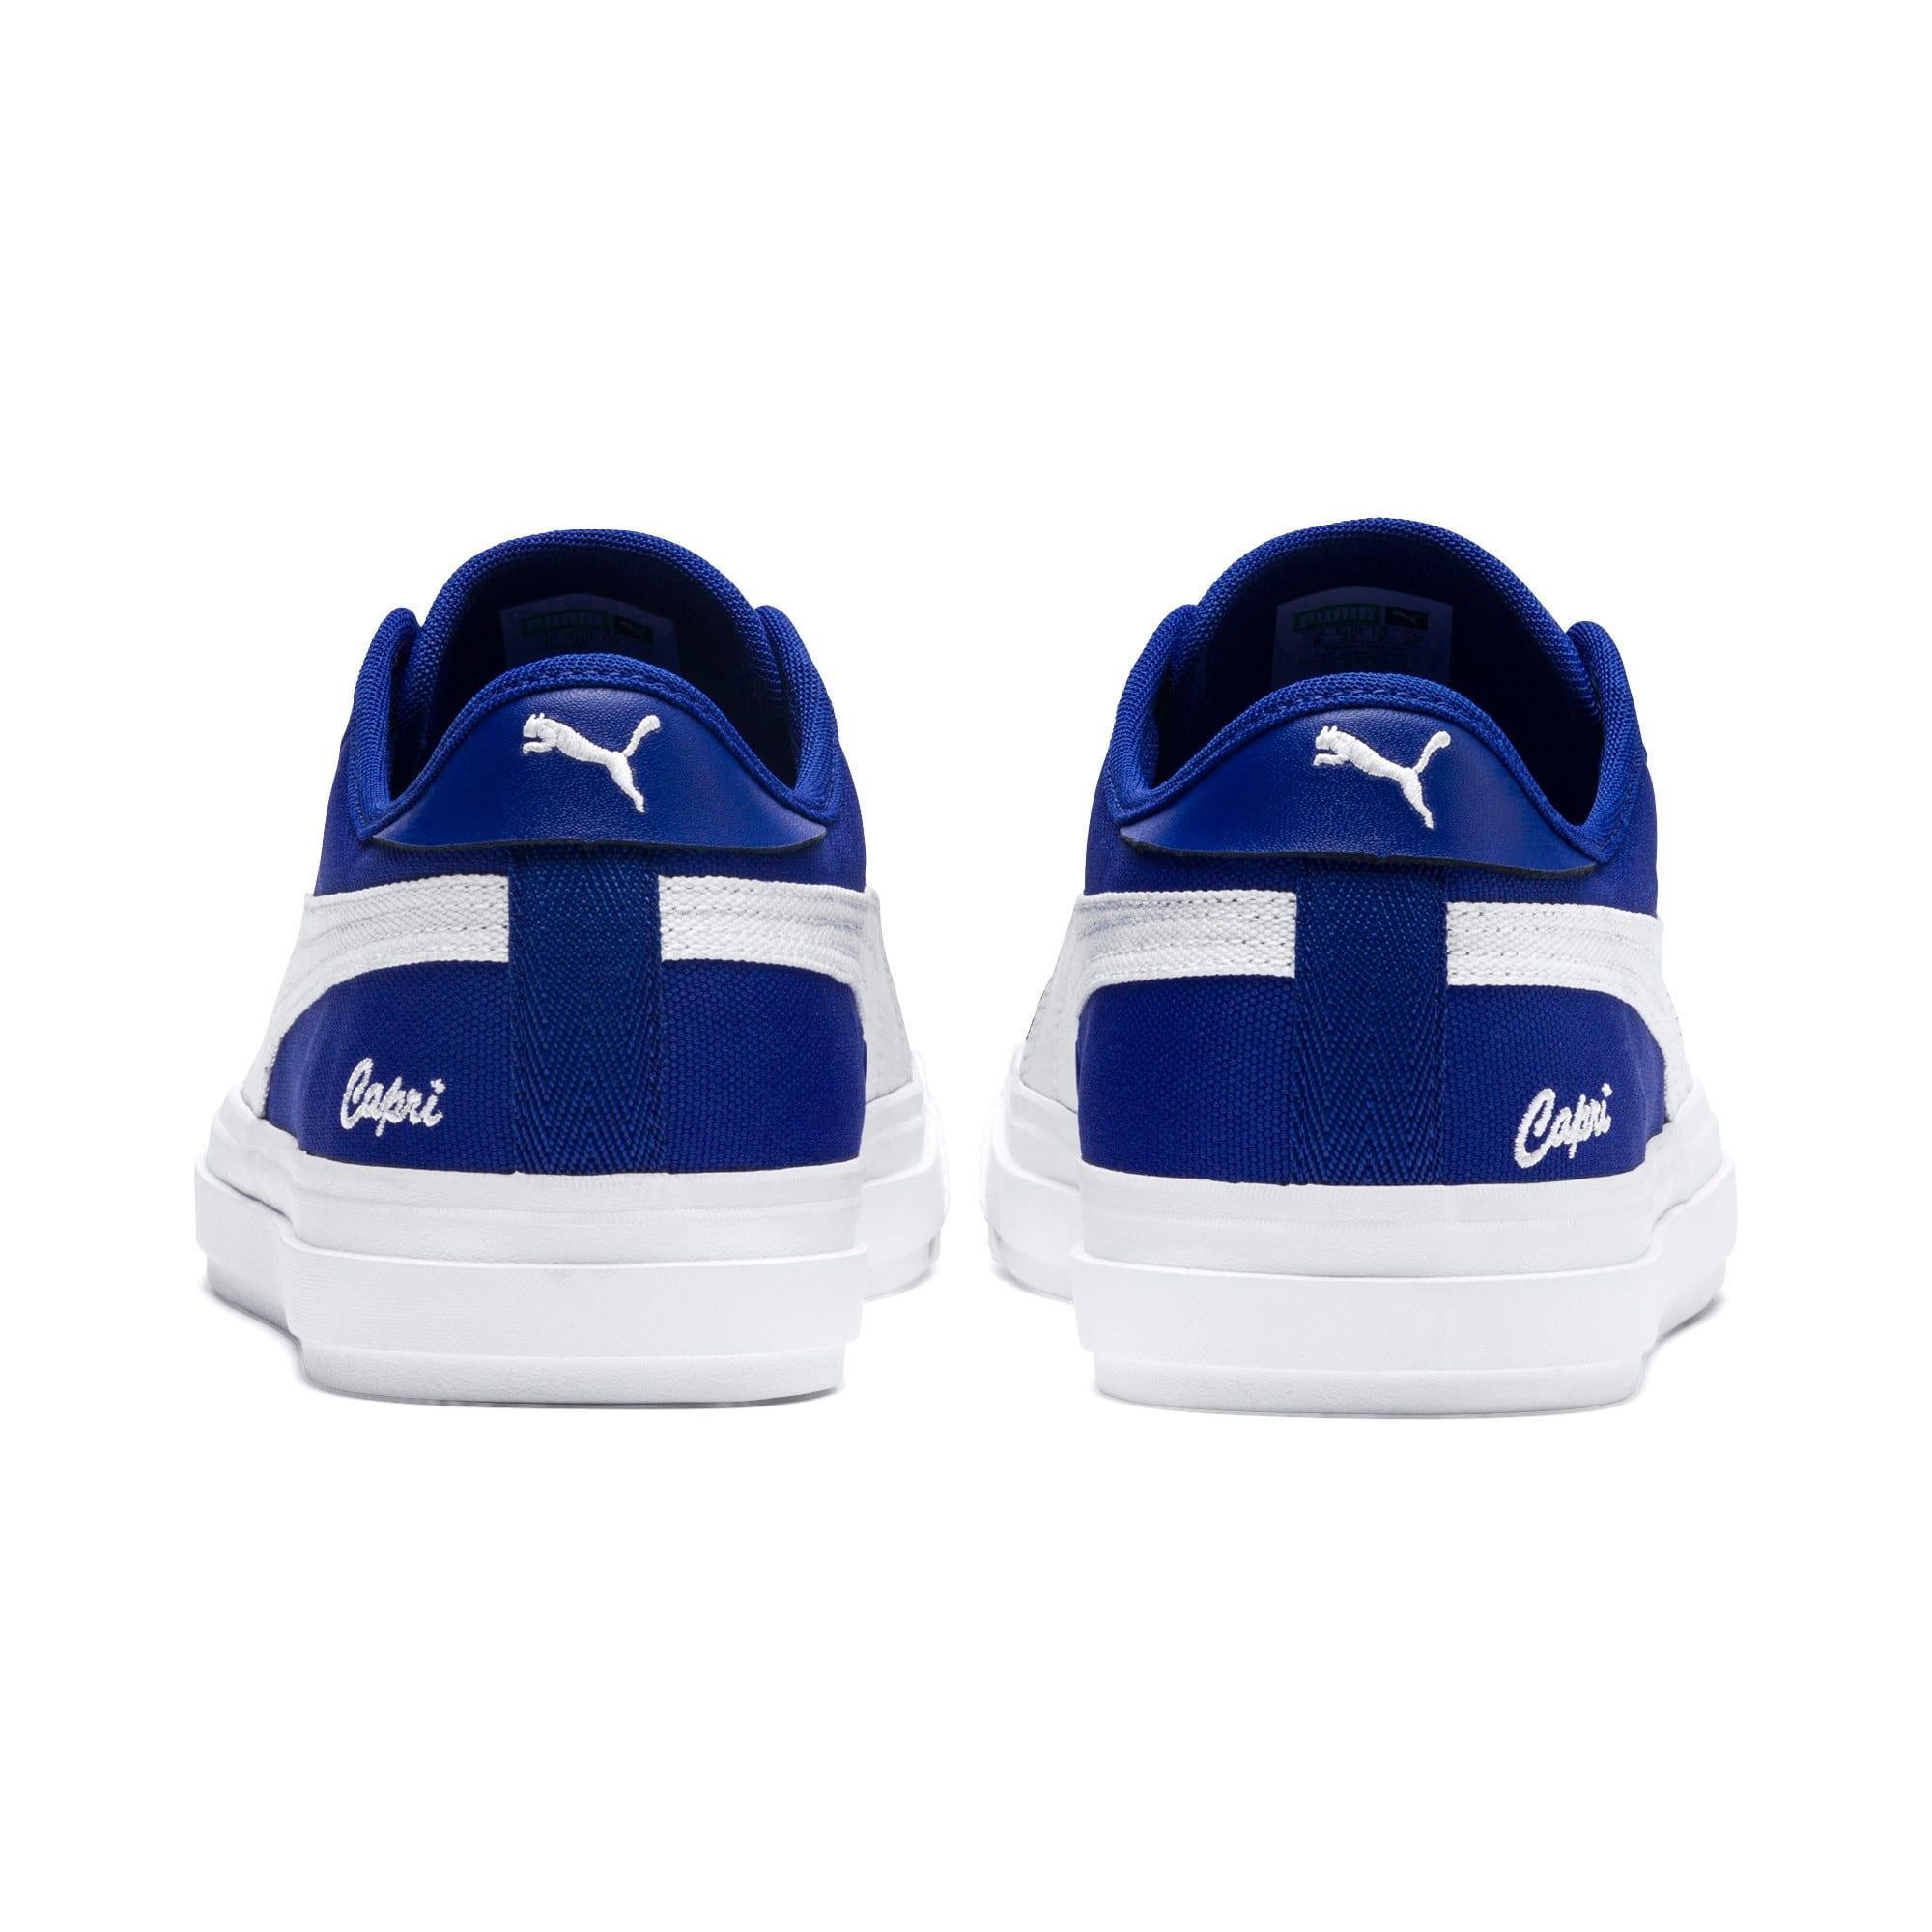 Thumbnail 3 of Capri Tennis Shoes, Surf DWeb-Puma Wht-Puma Wht, medium-IND